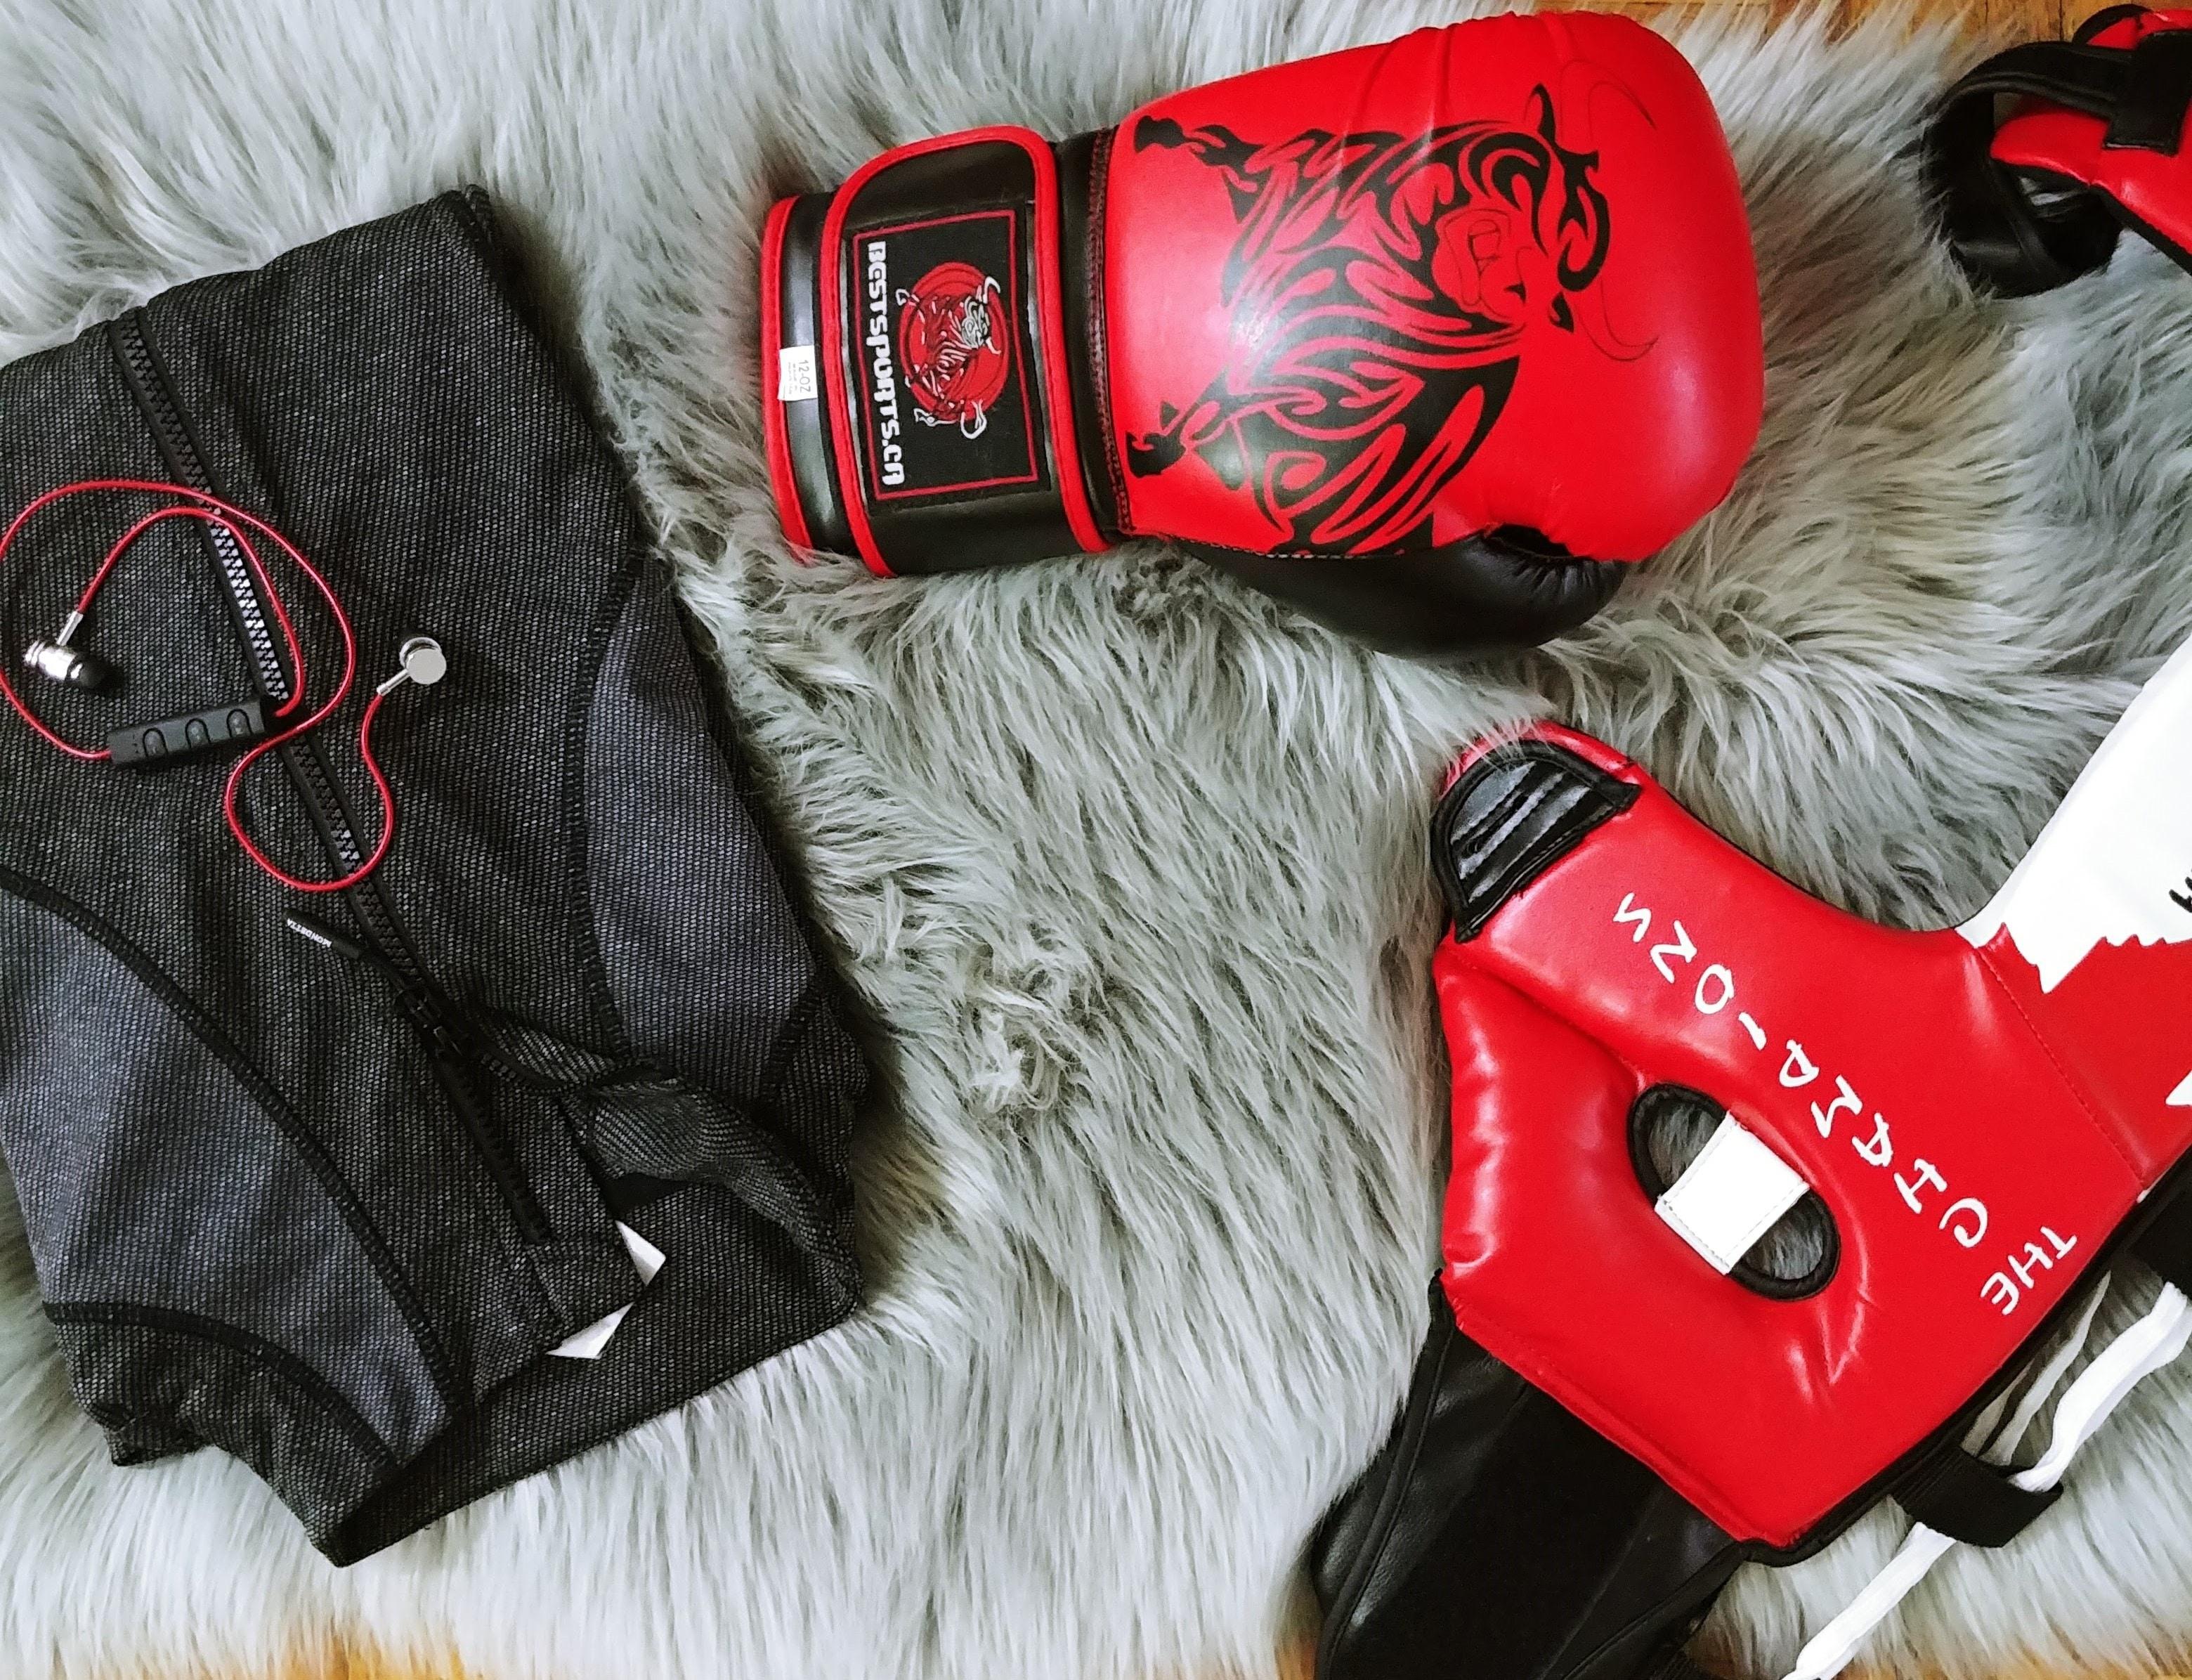 training glove, mask, and zip-up jacket